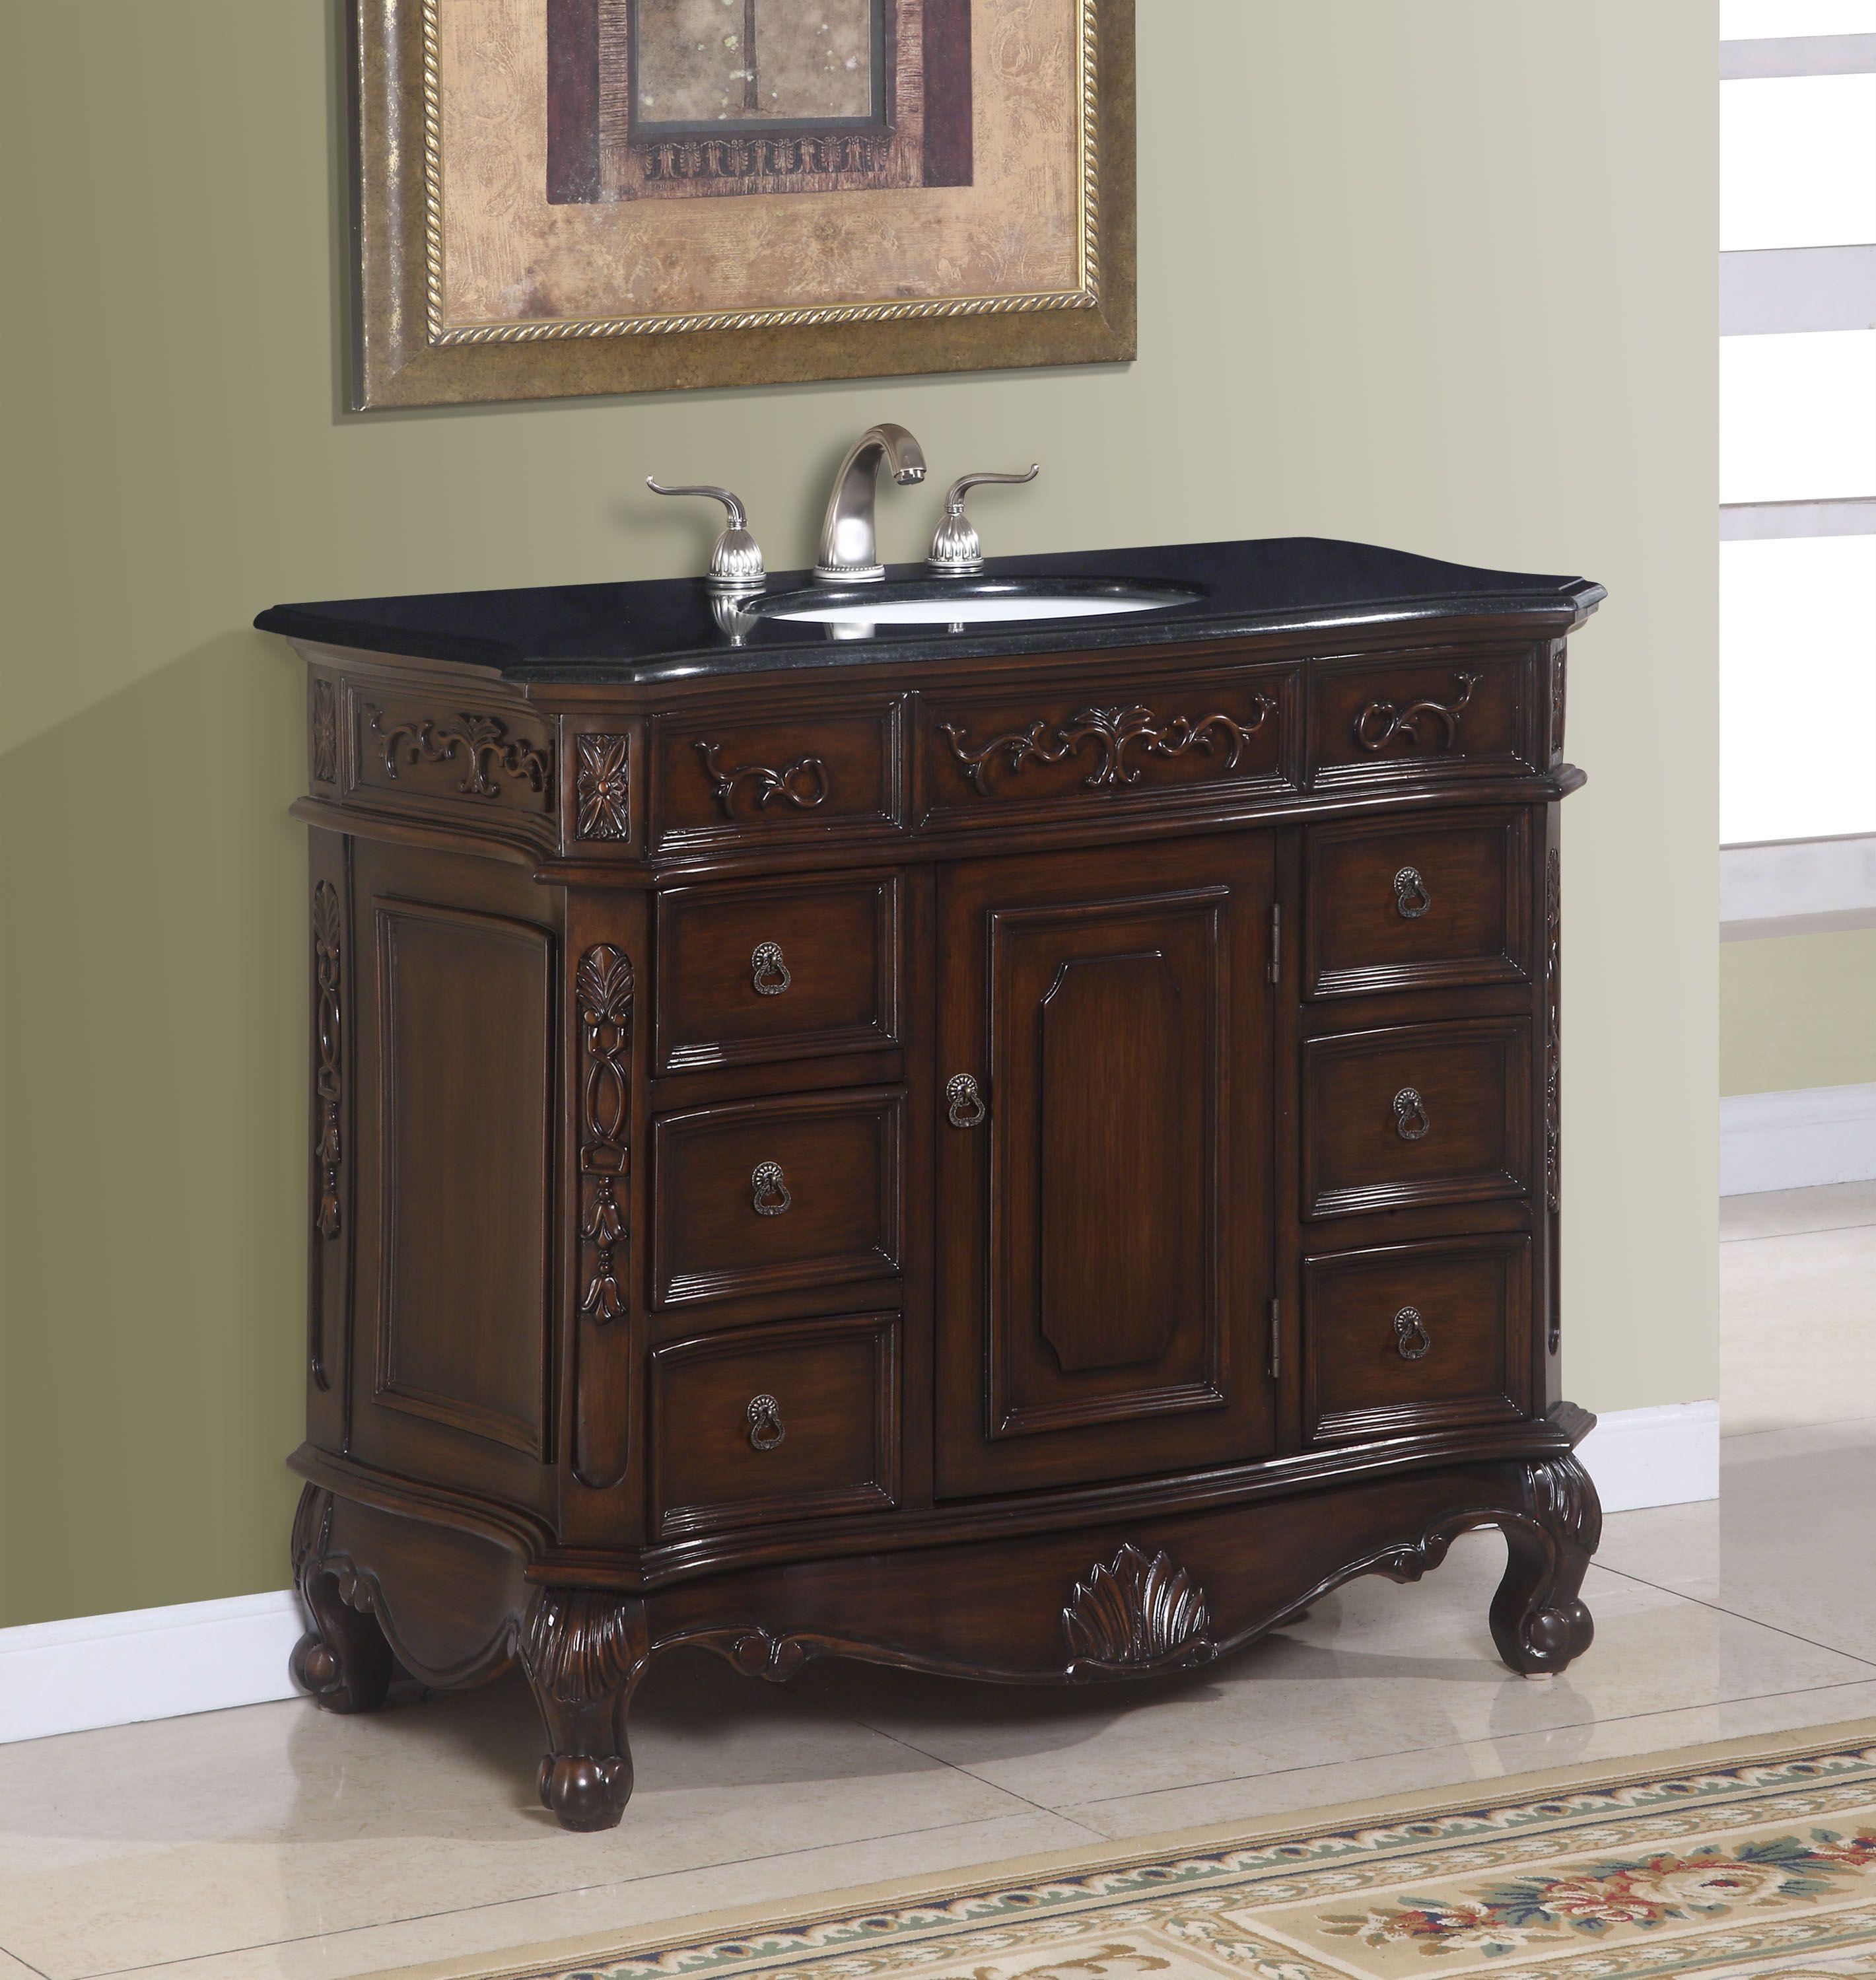 40 Inch Bath Vanity With Black Granite  Ica Furniture Products Amusing 40 Inch Bathroom Vanity Inspiration Design